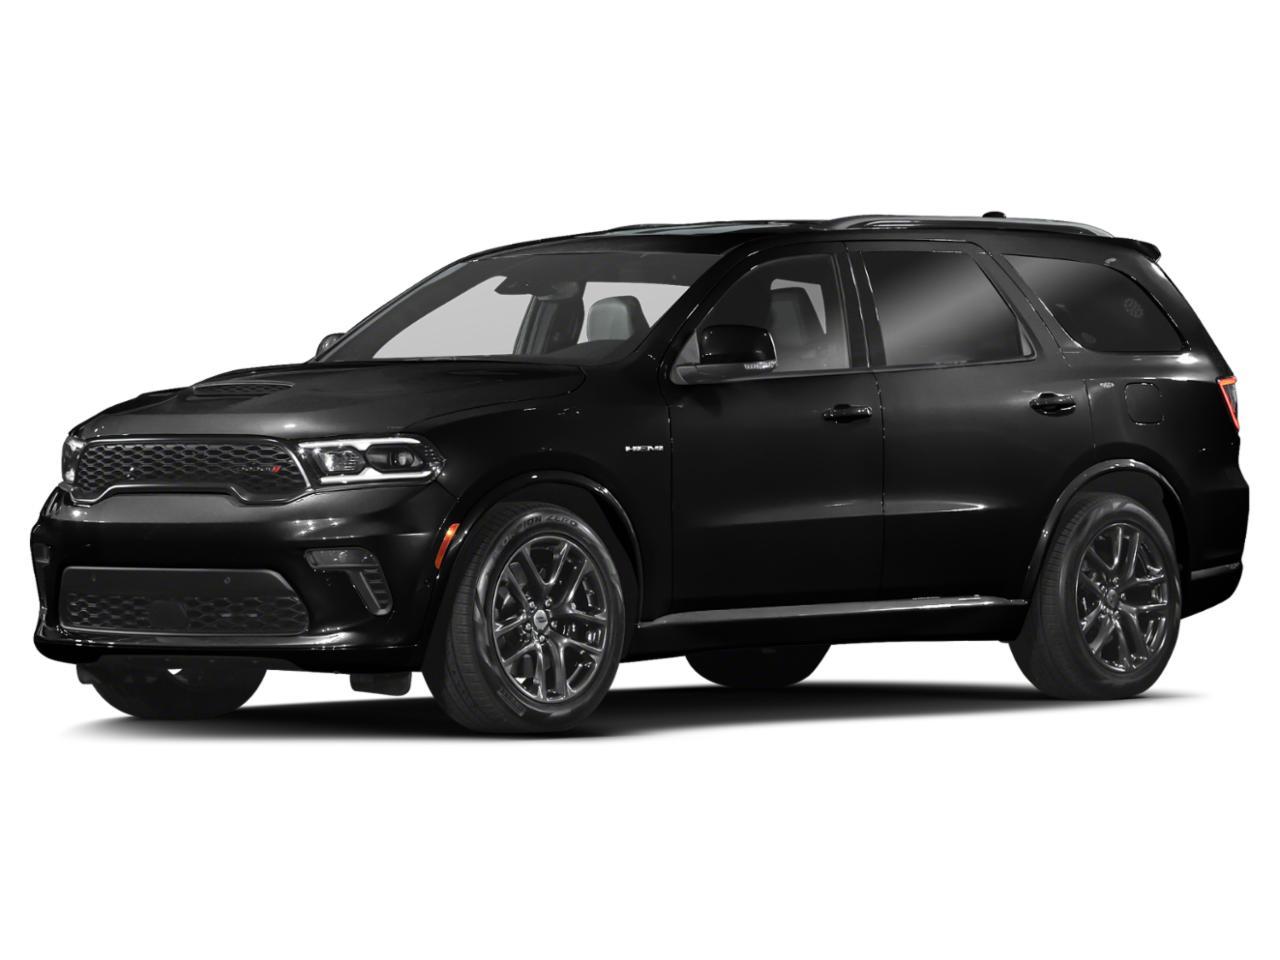 2021 Dodge Durango Vehicle Photo in Oshkosh, WI 54901